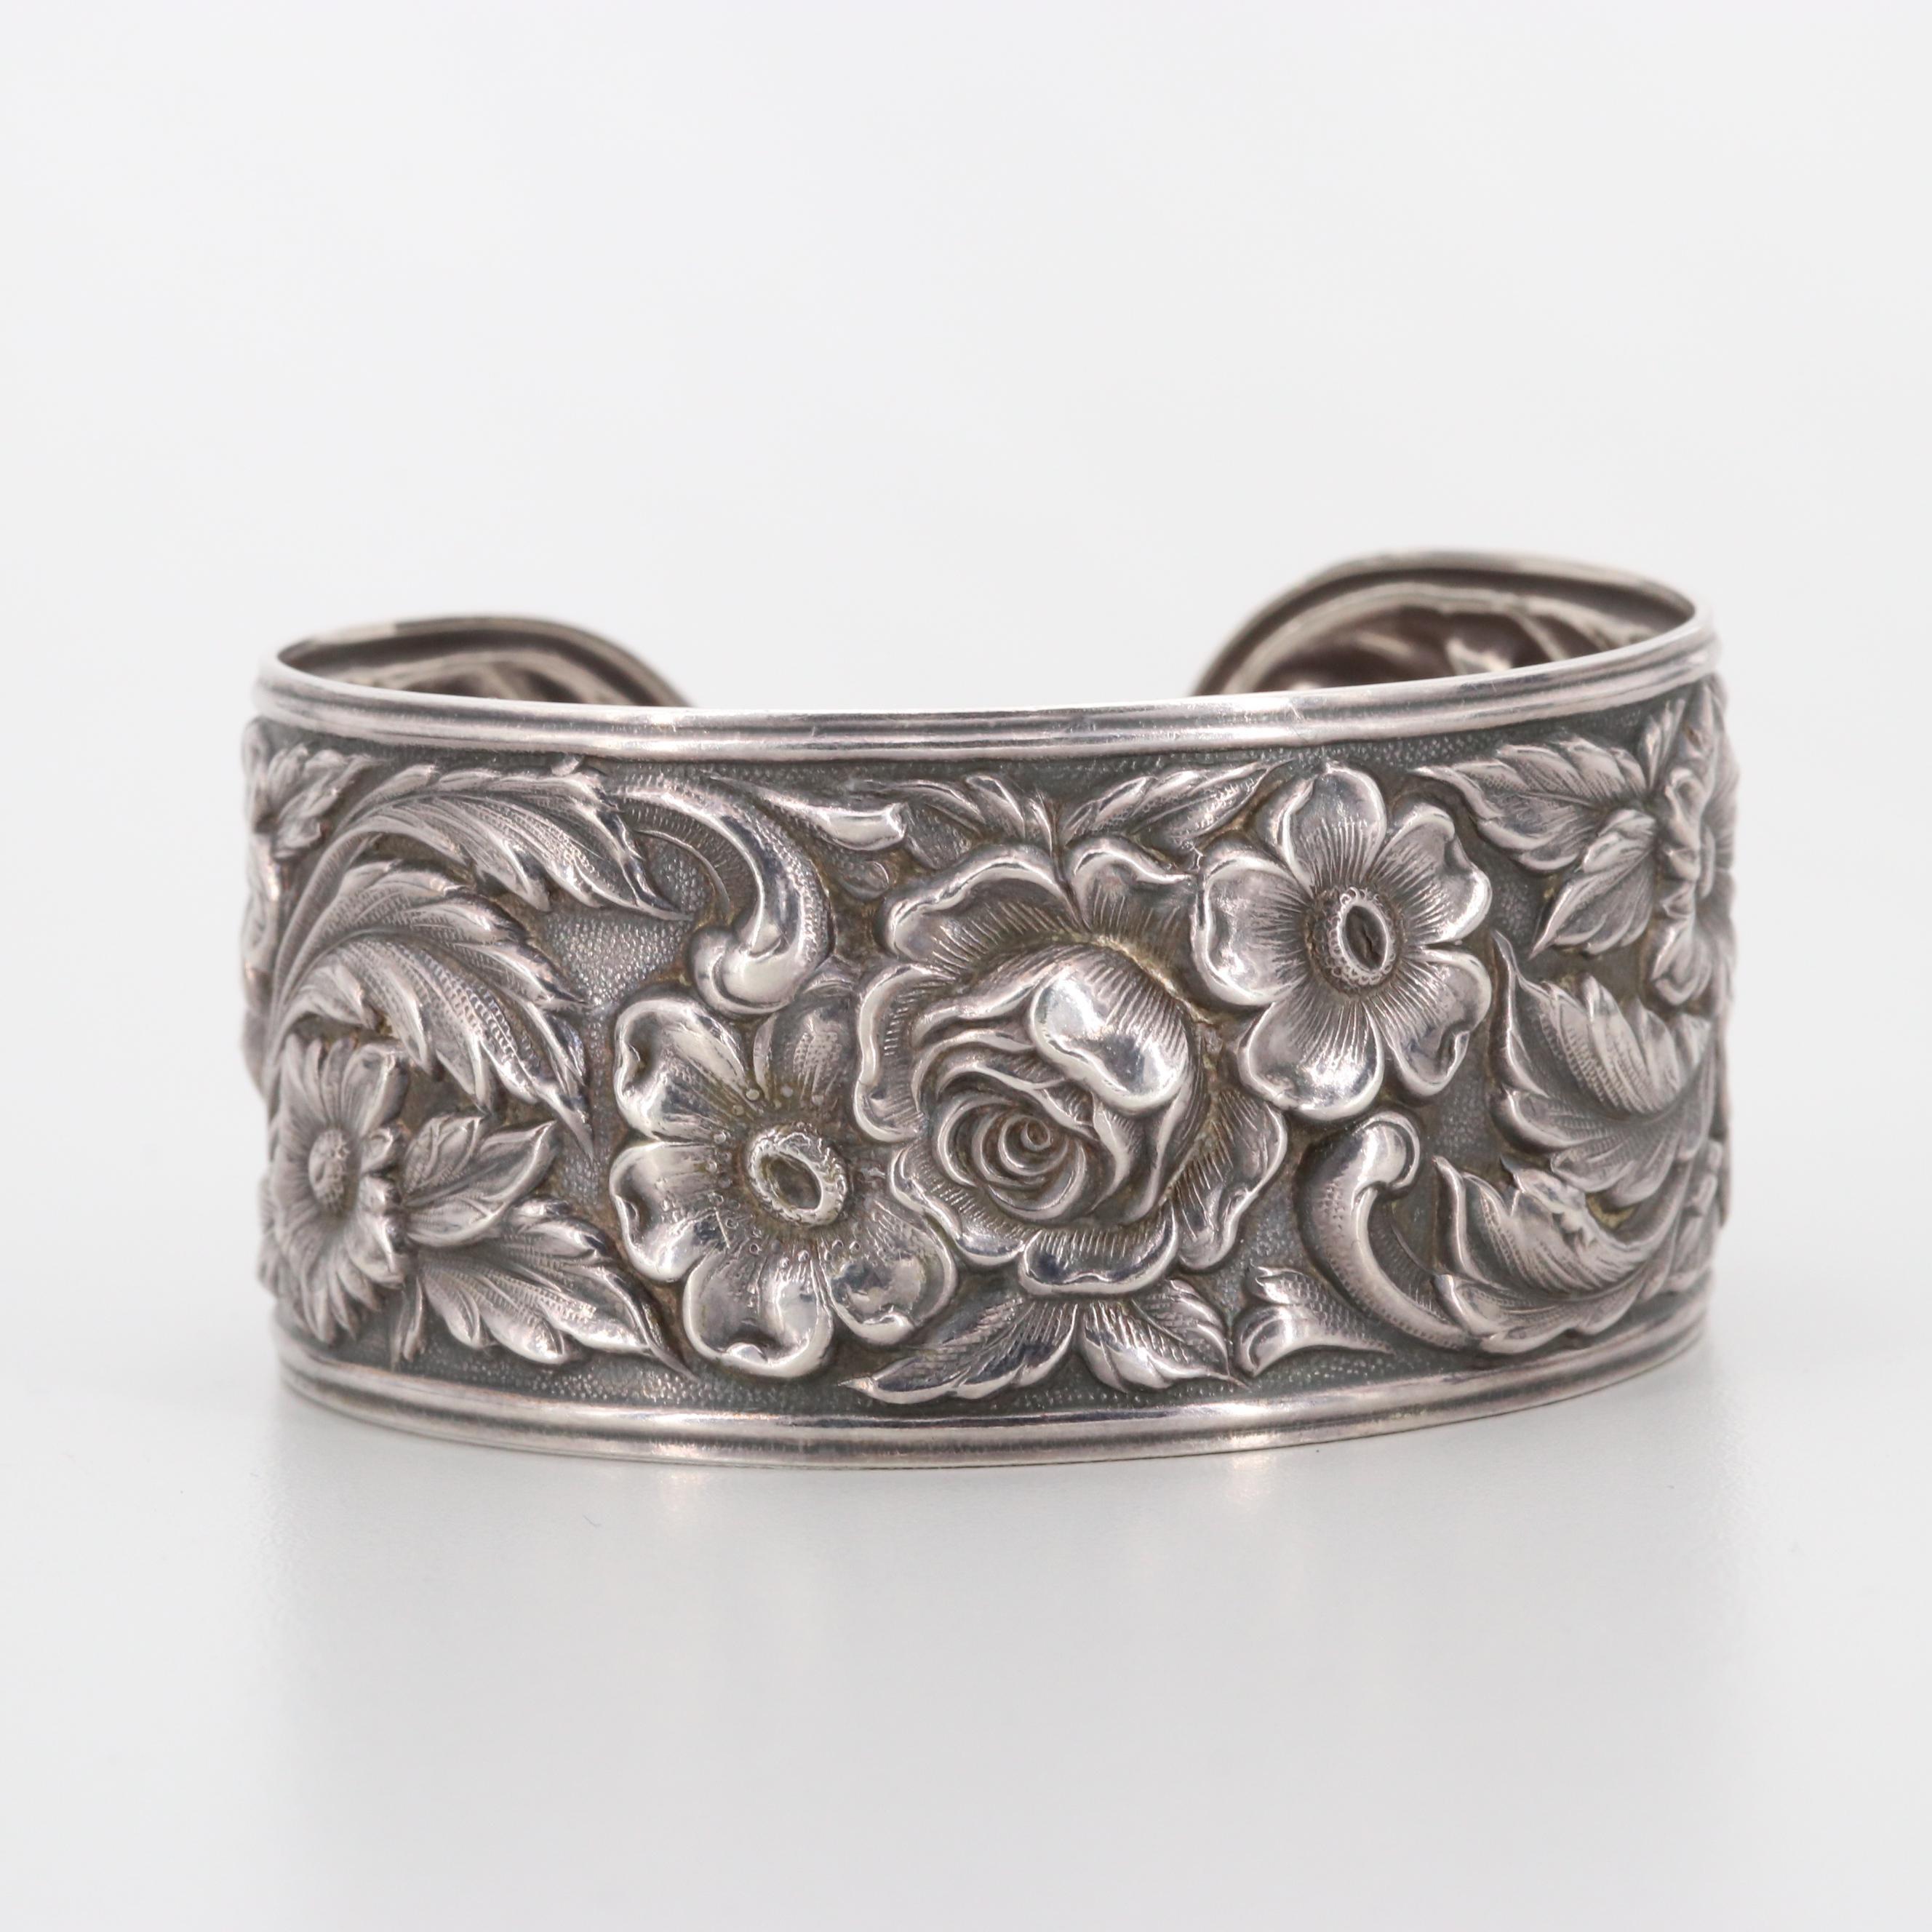 S. Kirk & Son Sterling Silver Cuff Floral Motif Cuff Bracelet